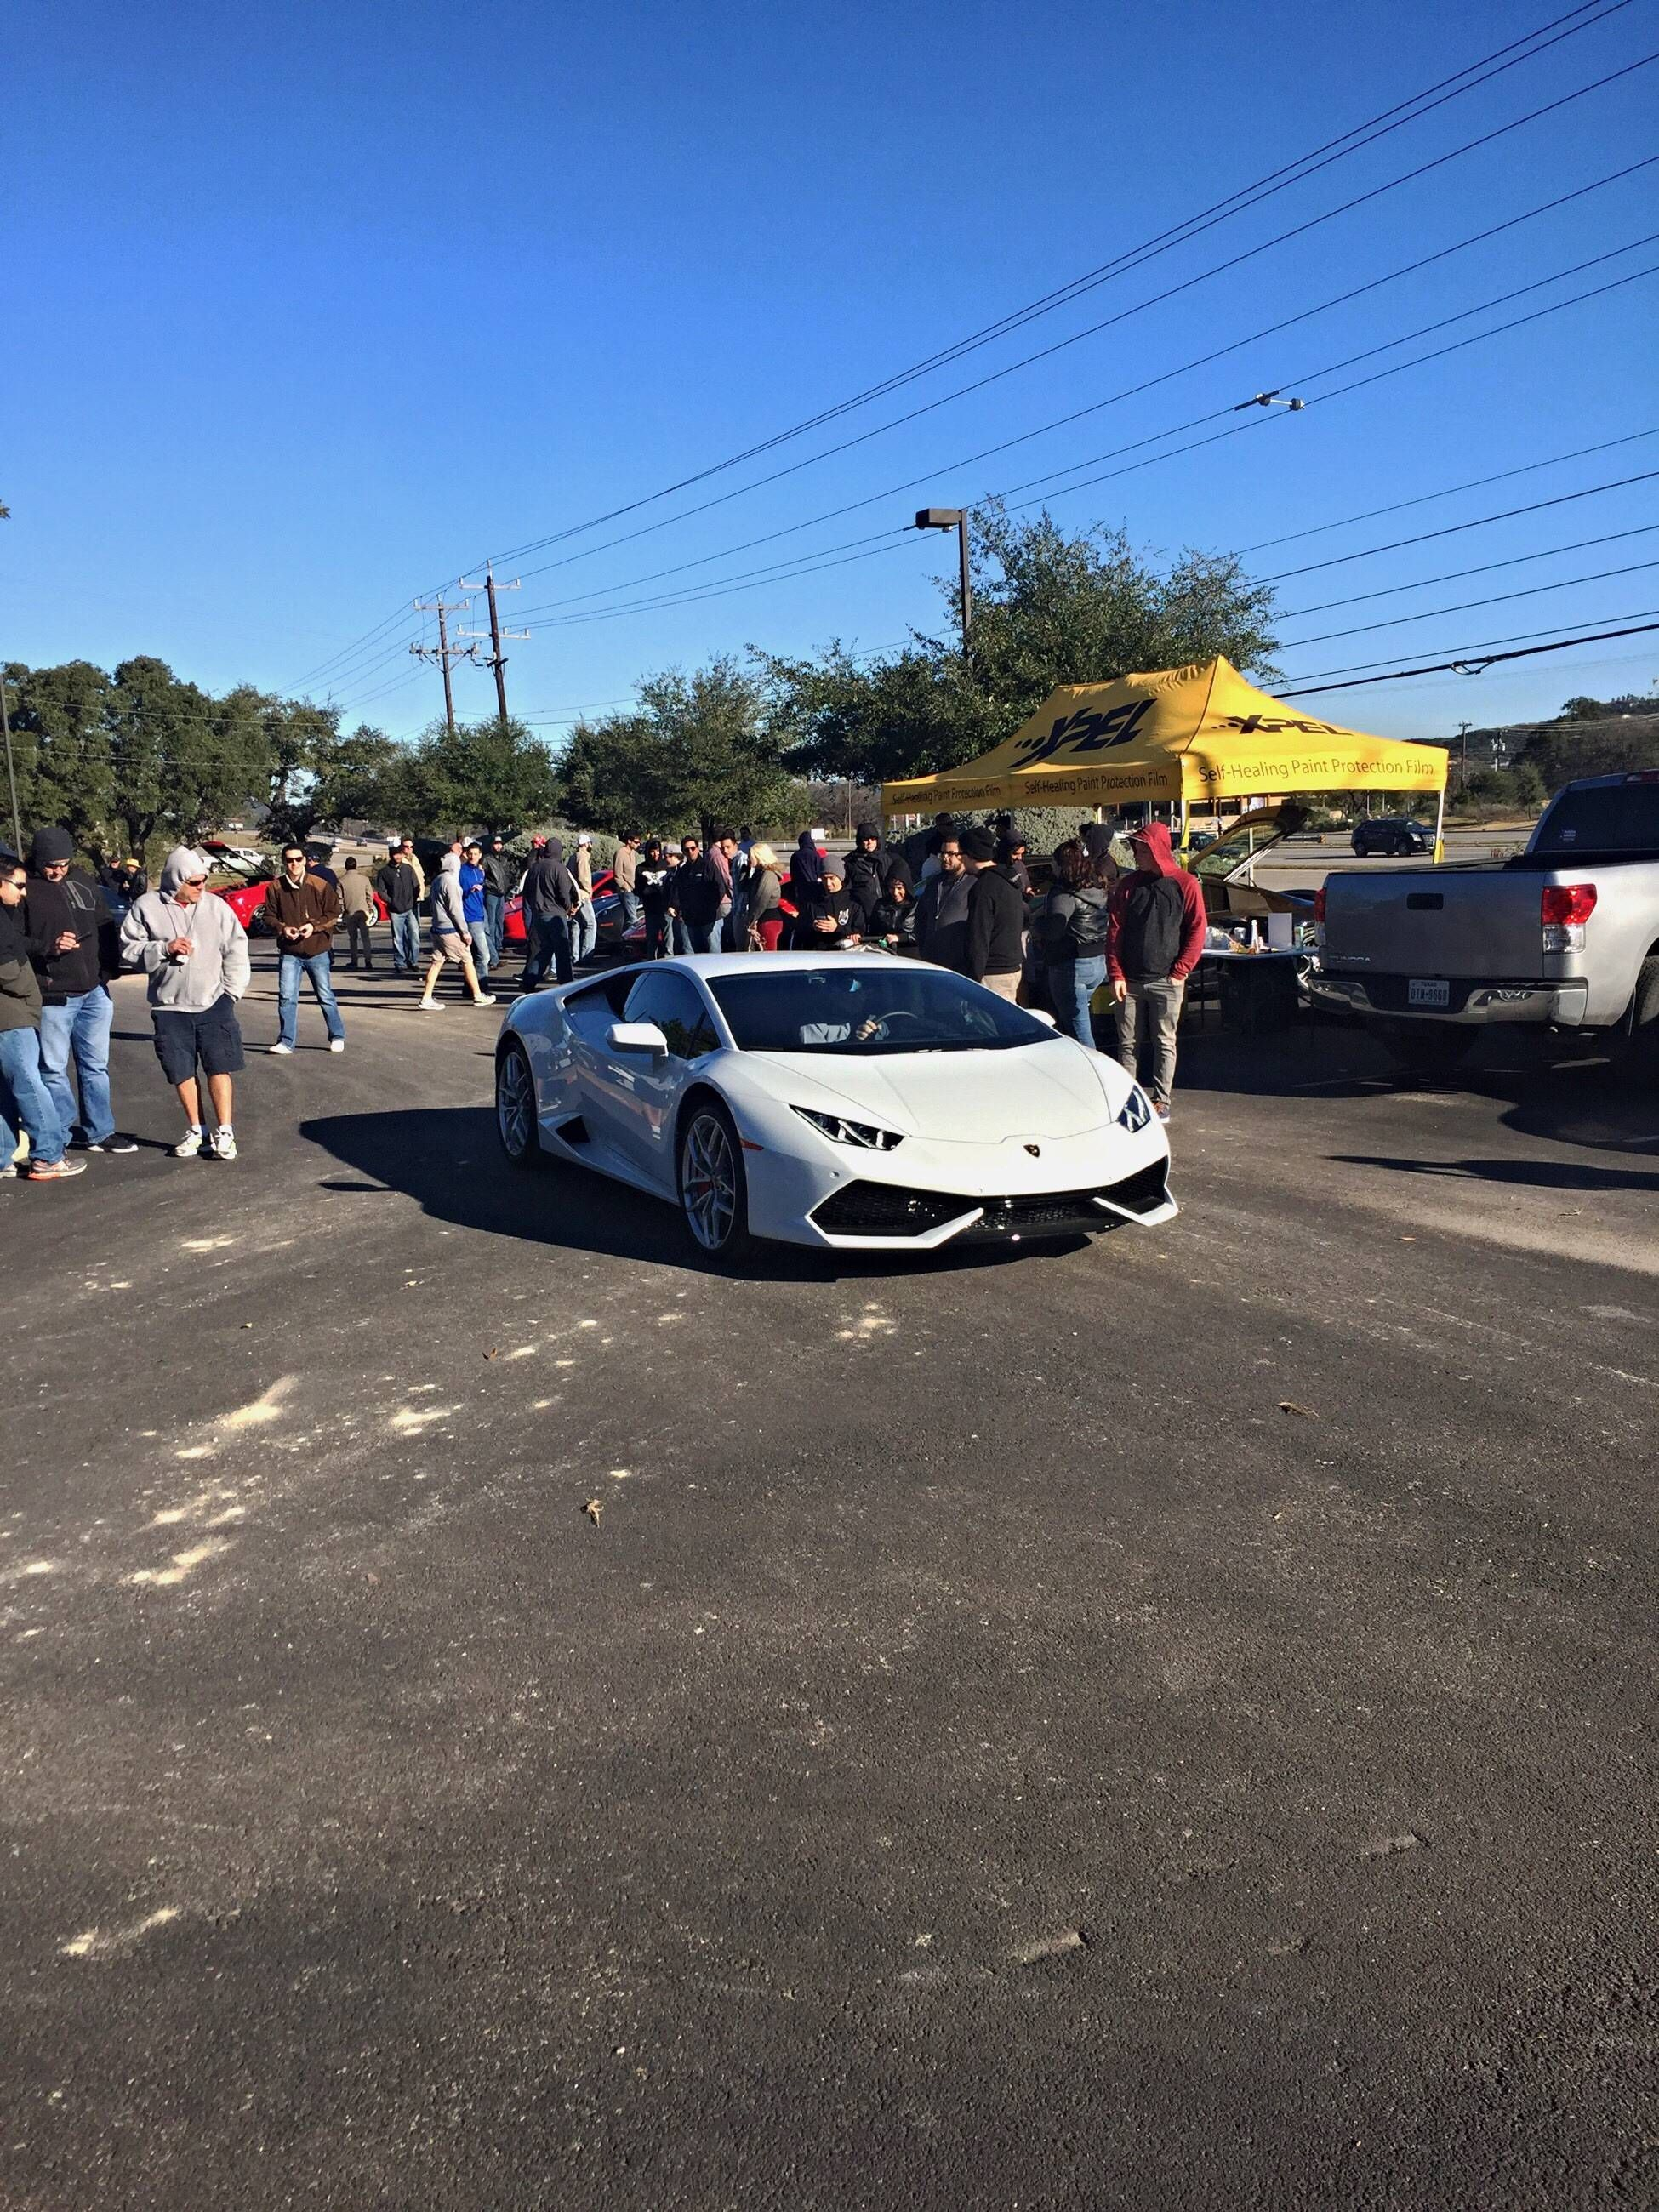 Lamborghini Huracán At San Antonio Cu0026C [3264 X 2448] ...